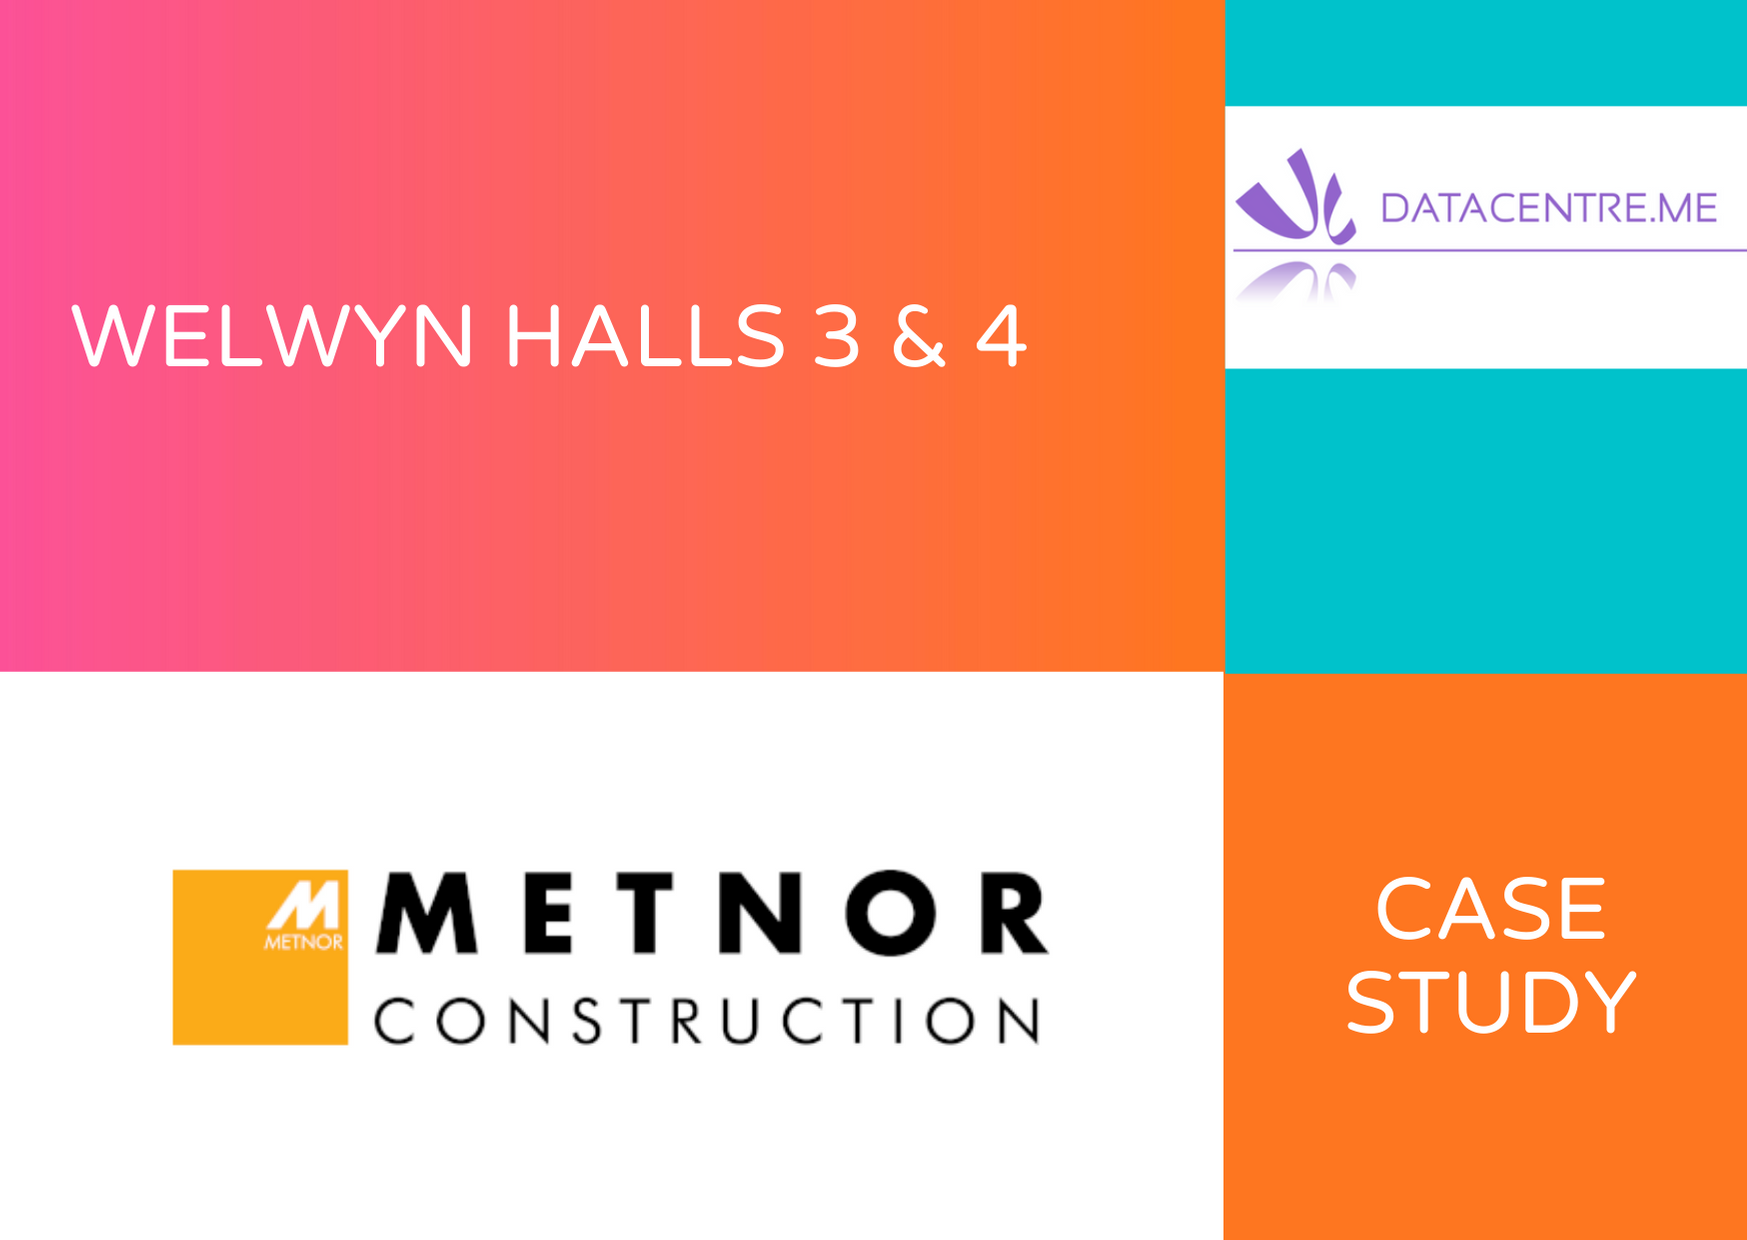 Welwyn Halls 3 & 4 - Metnor Case Study Image